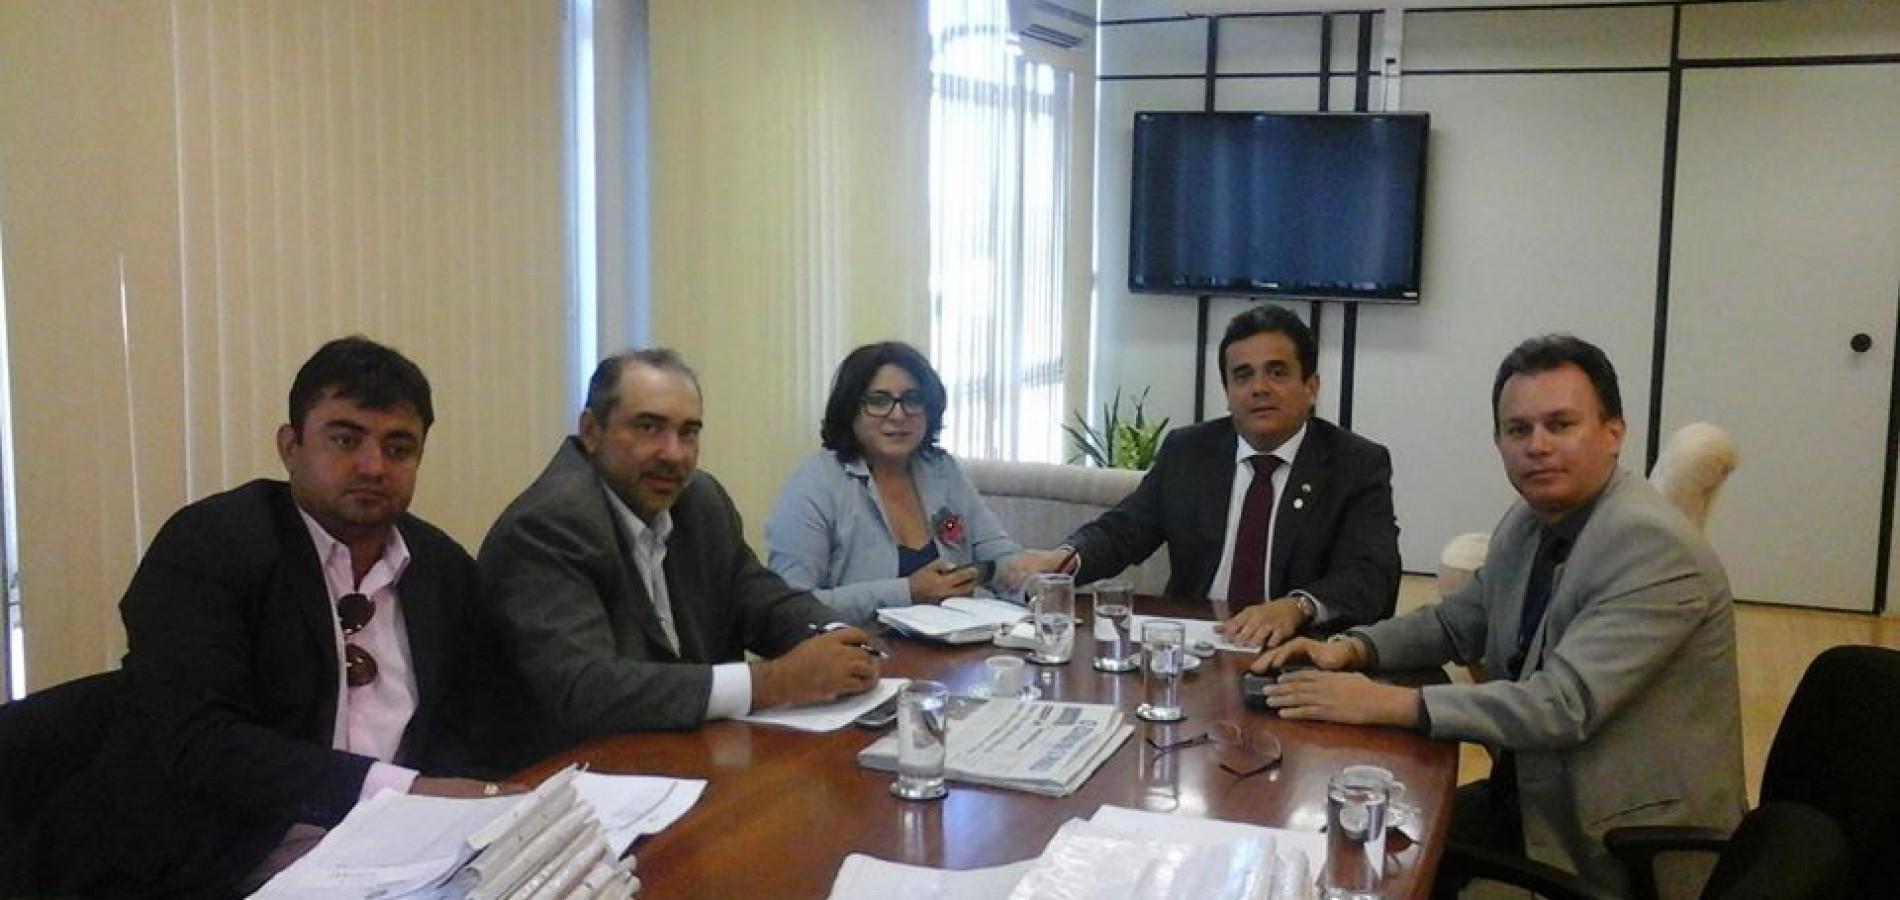 Prefeito vai a Brasília e garante recursos para o município de Alegrete do Piauí